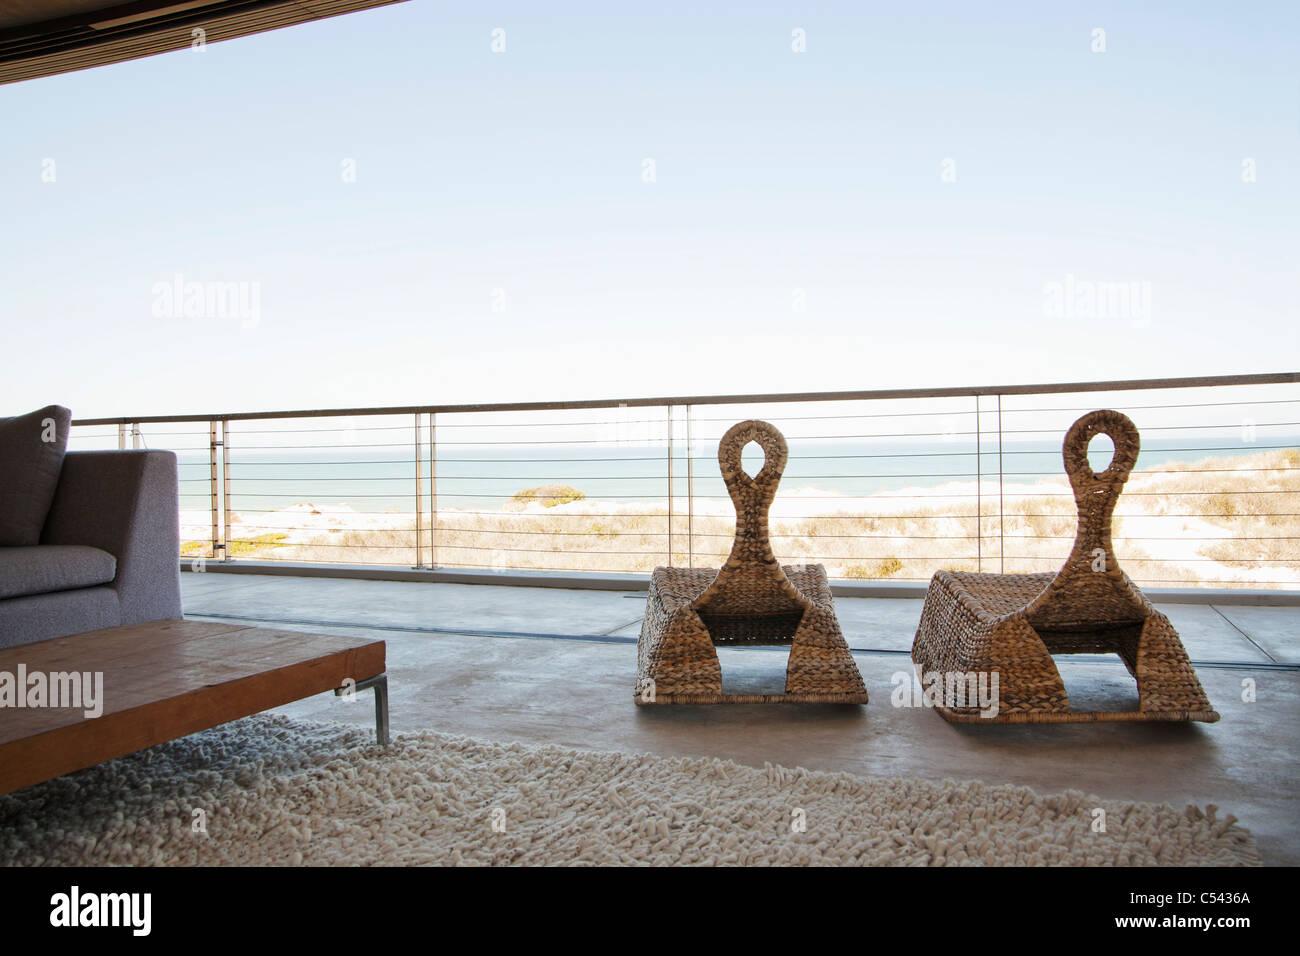 Vista de la playa vista a través de balcón Imagen De Stock